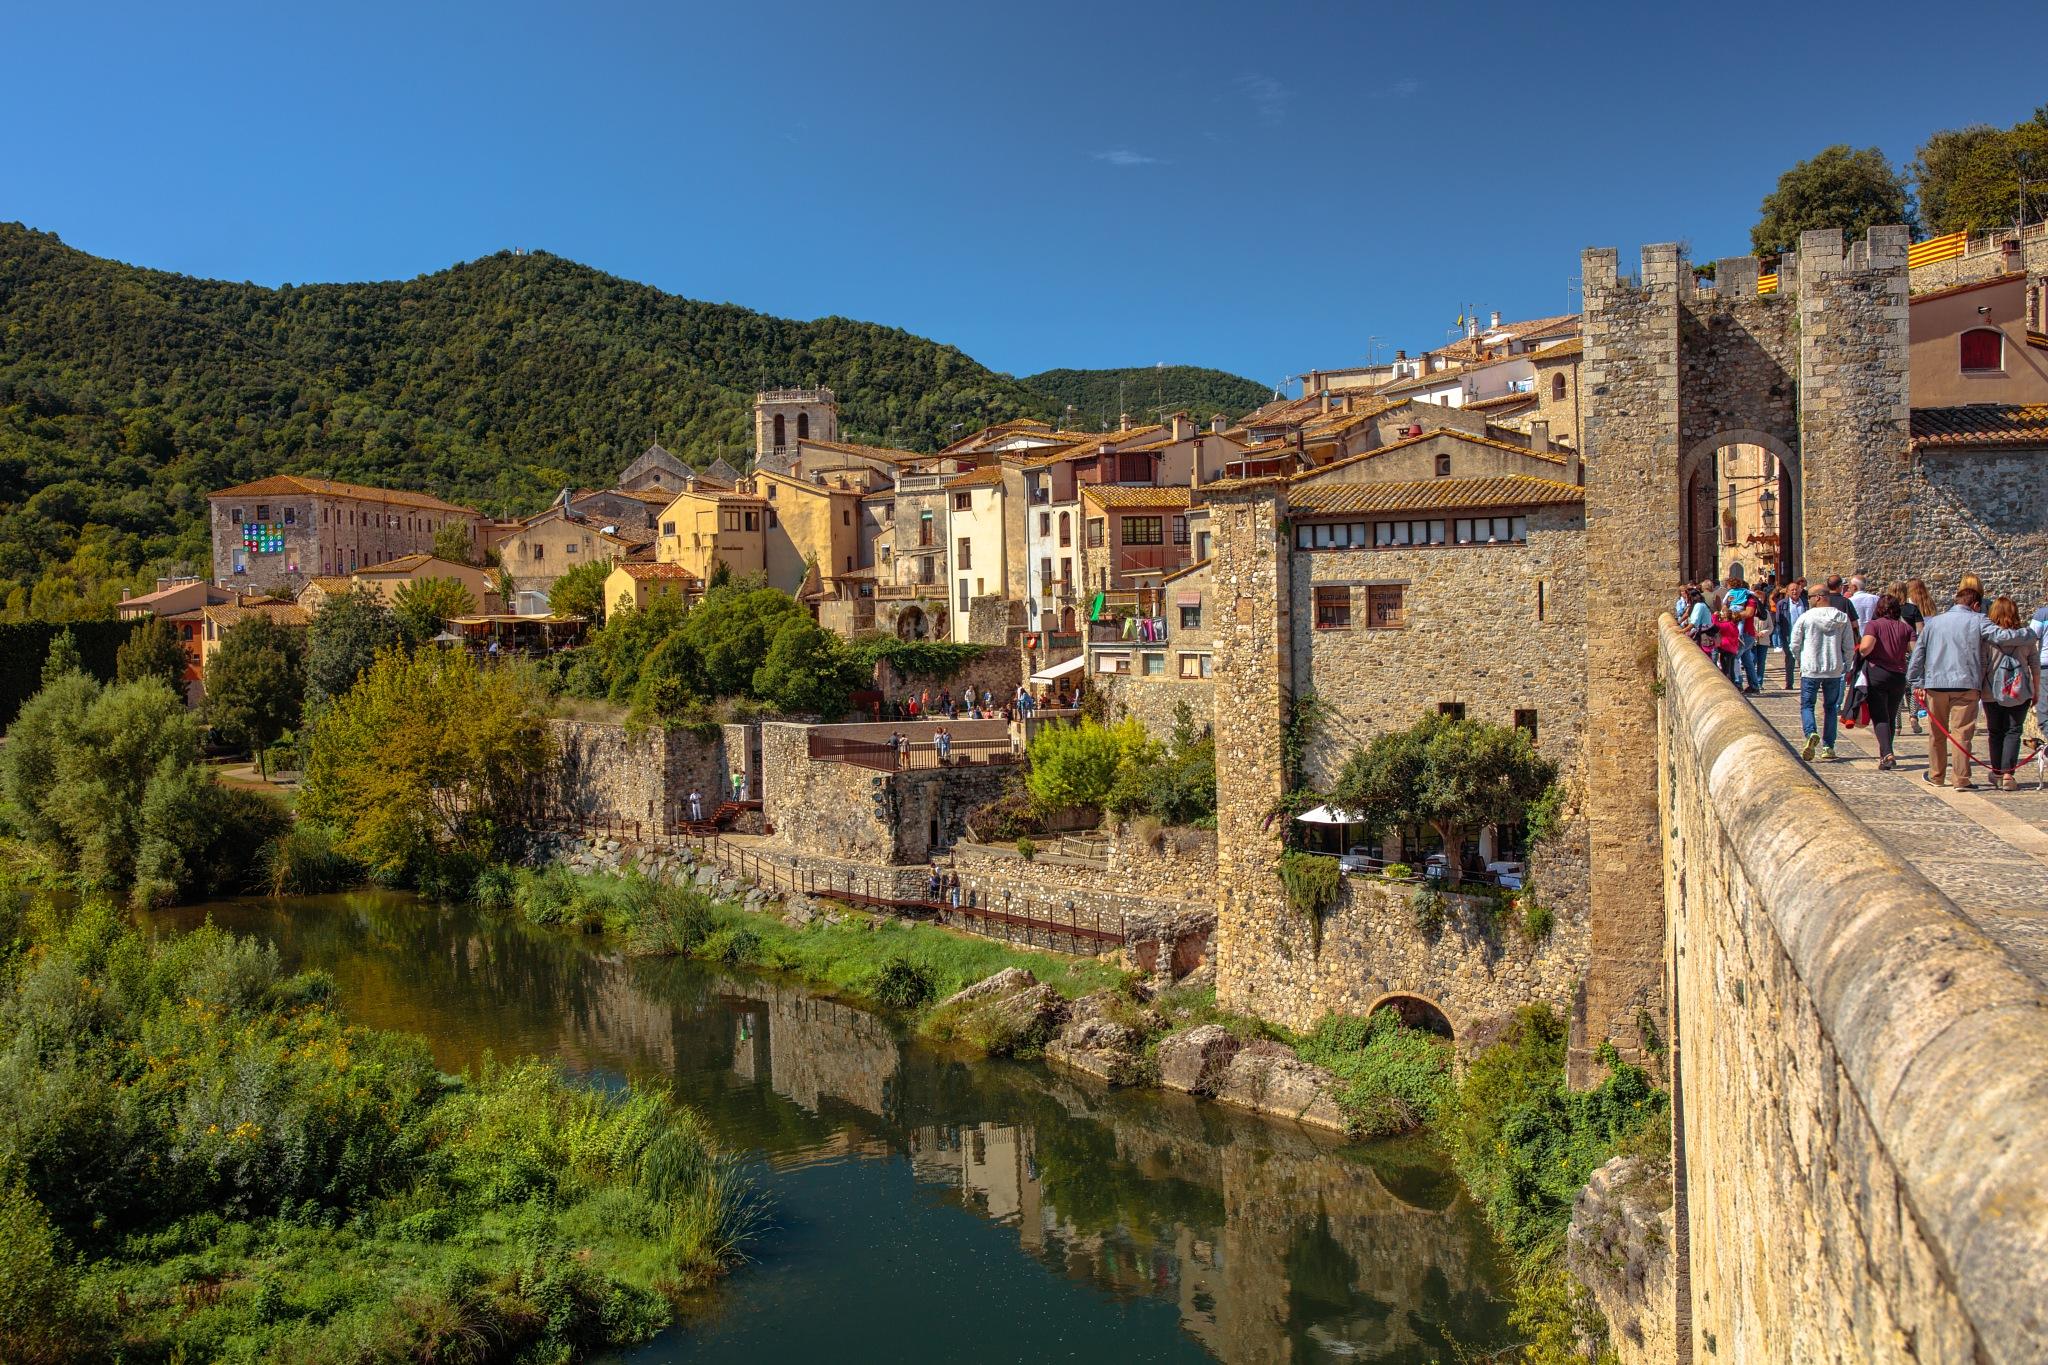 Besalú, Girona by Roberto Gonzalo Romero